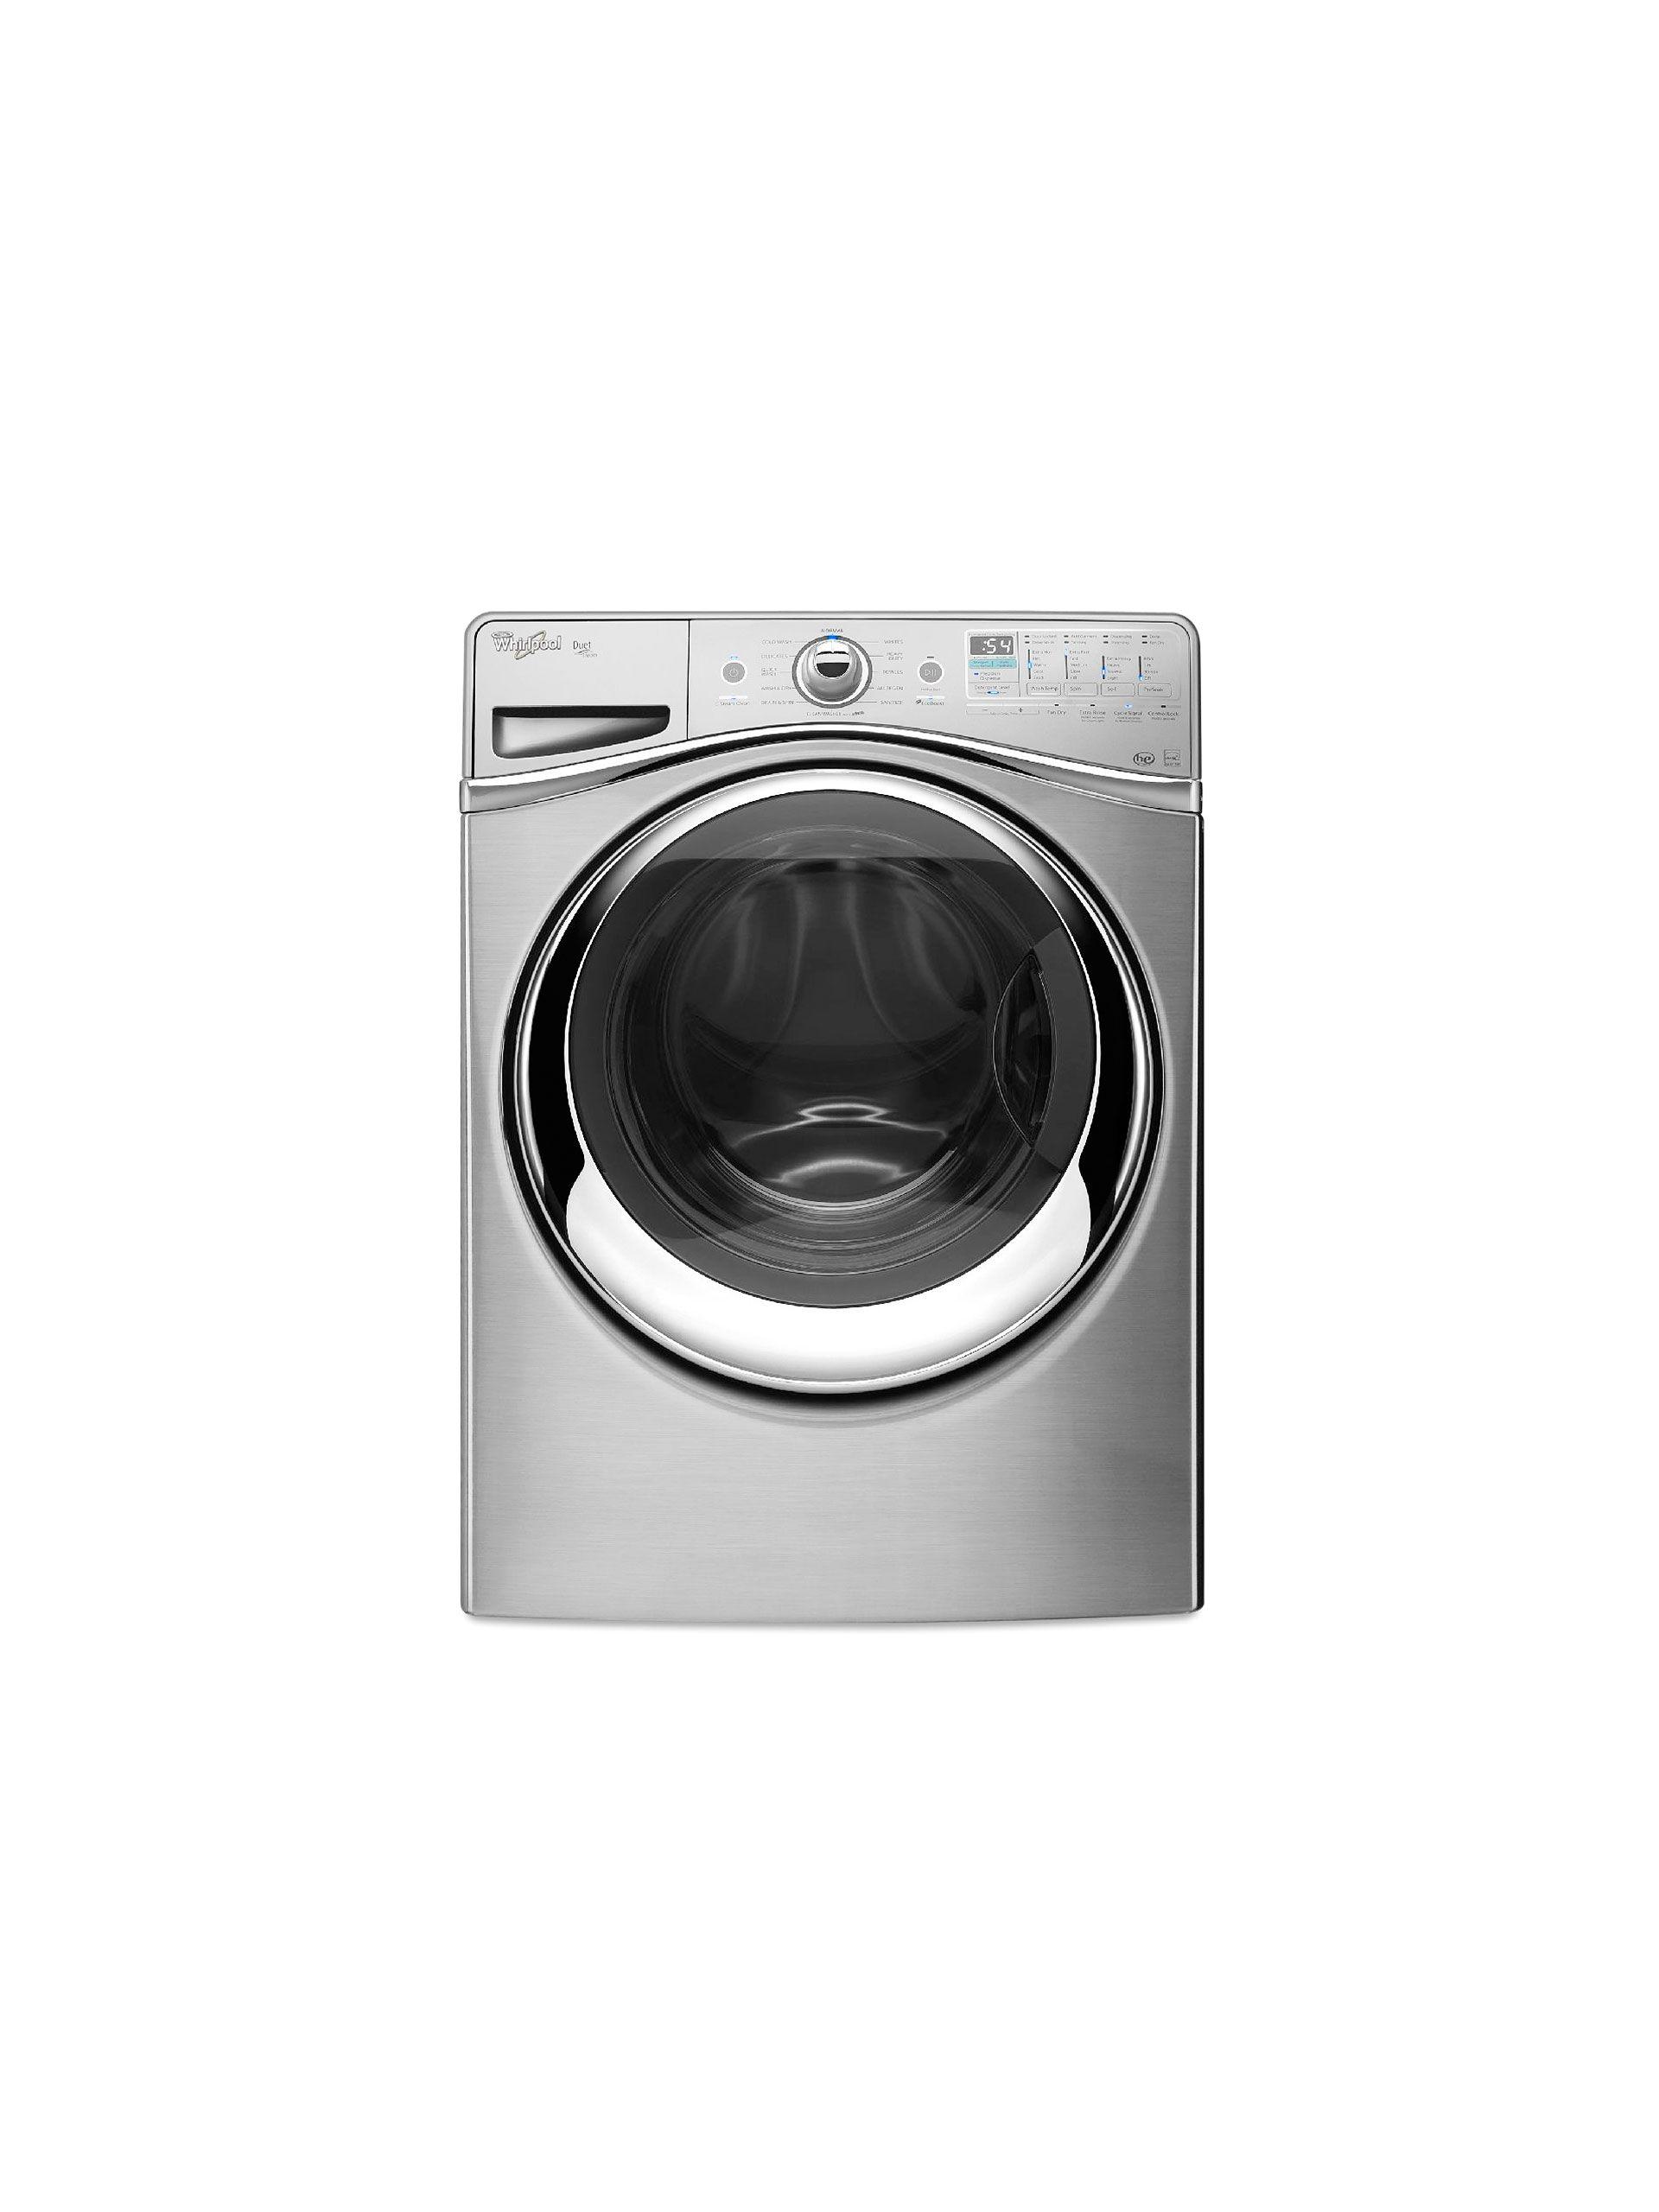 Pin On Laundry Dreams